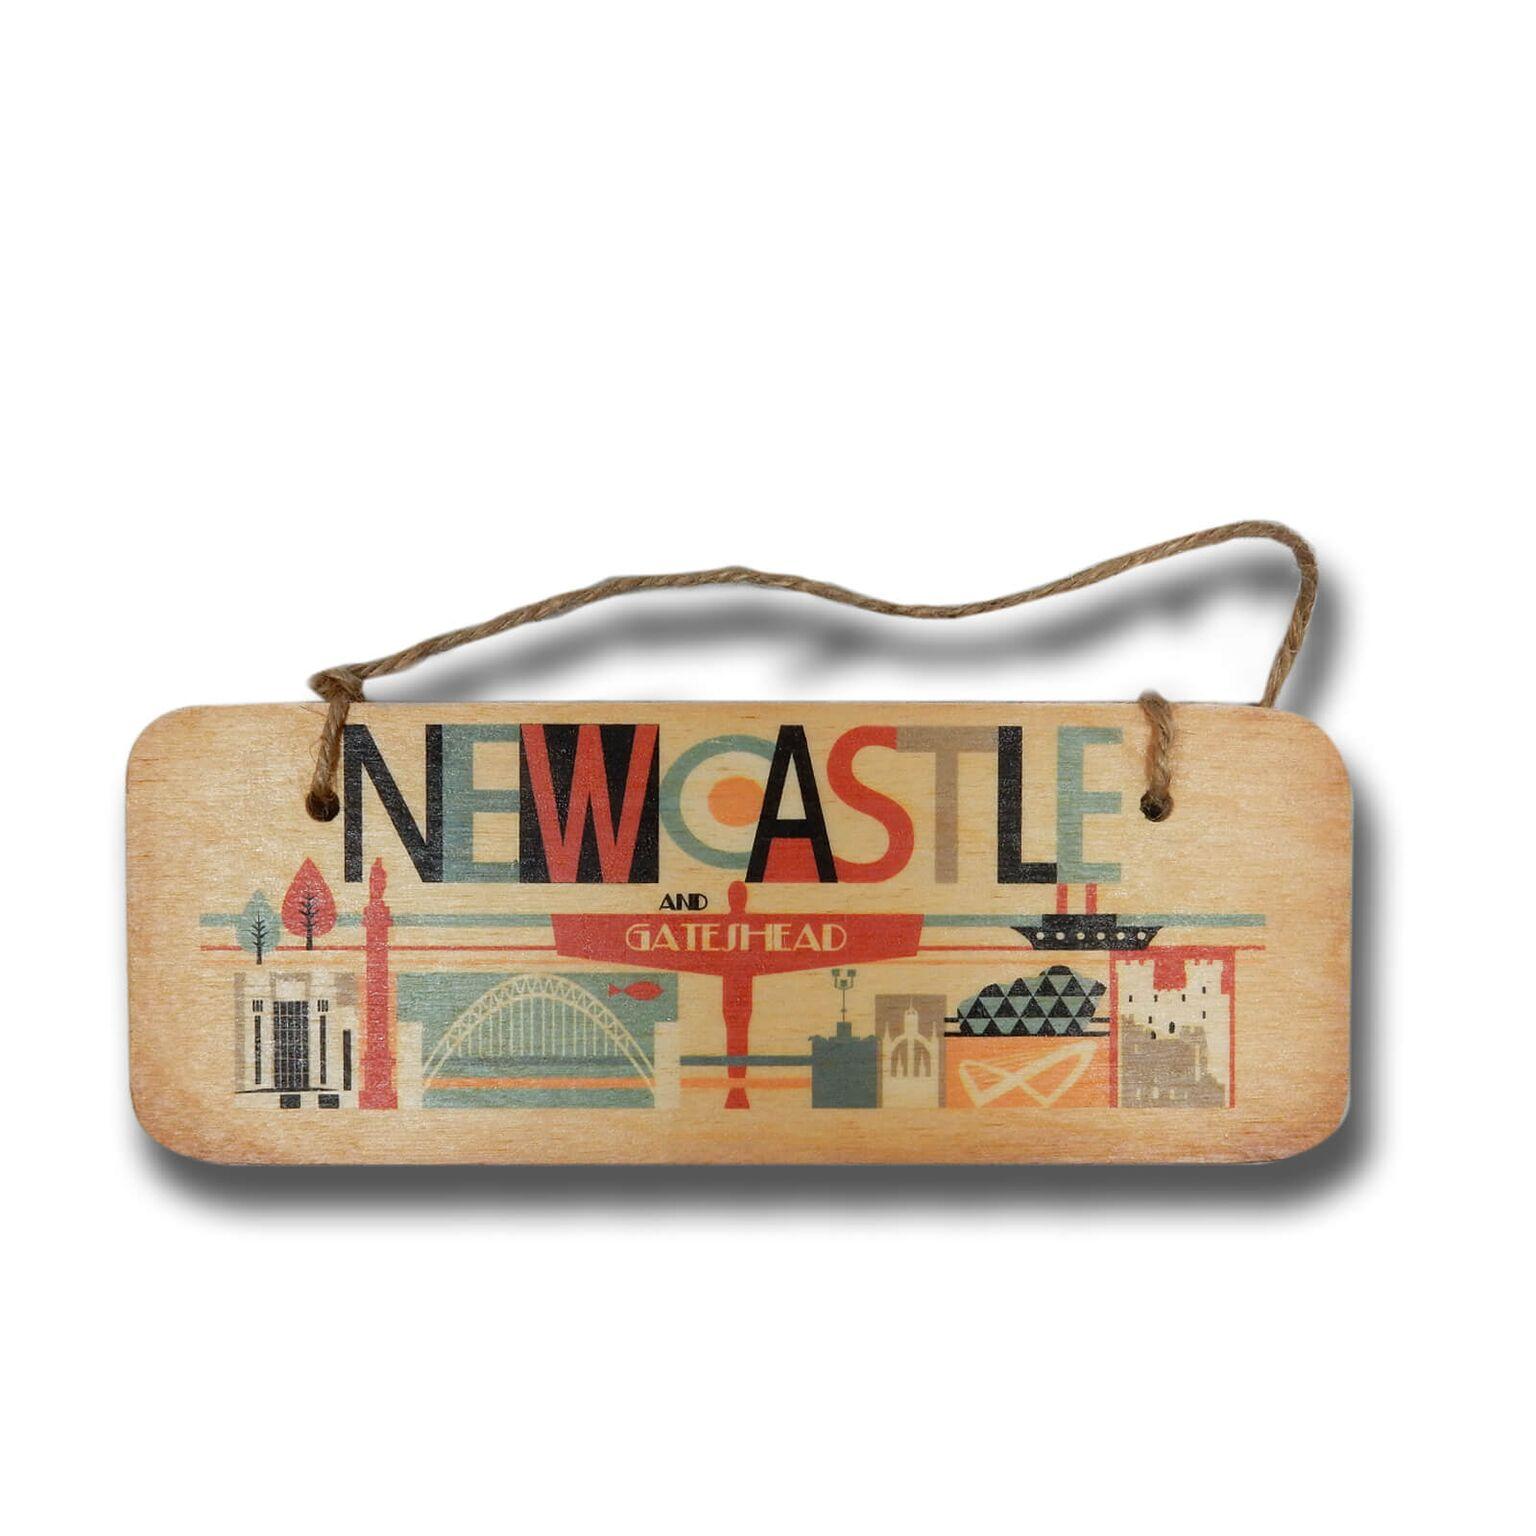 Newcastle & Gateshead Illustrated Plaque